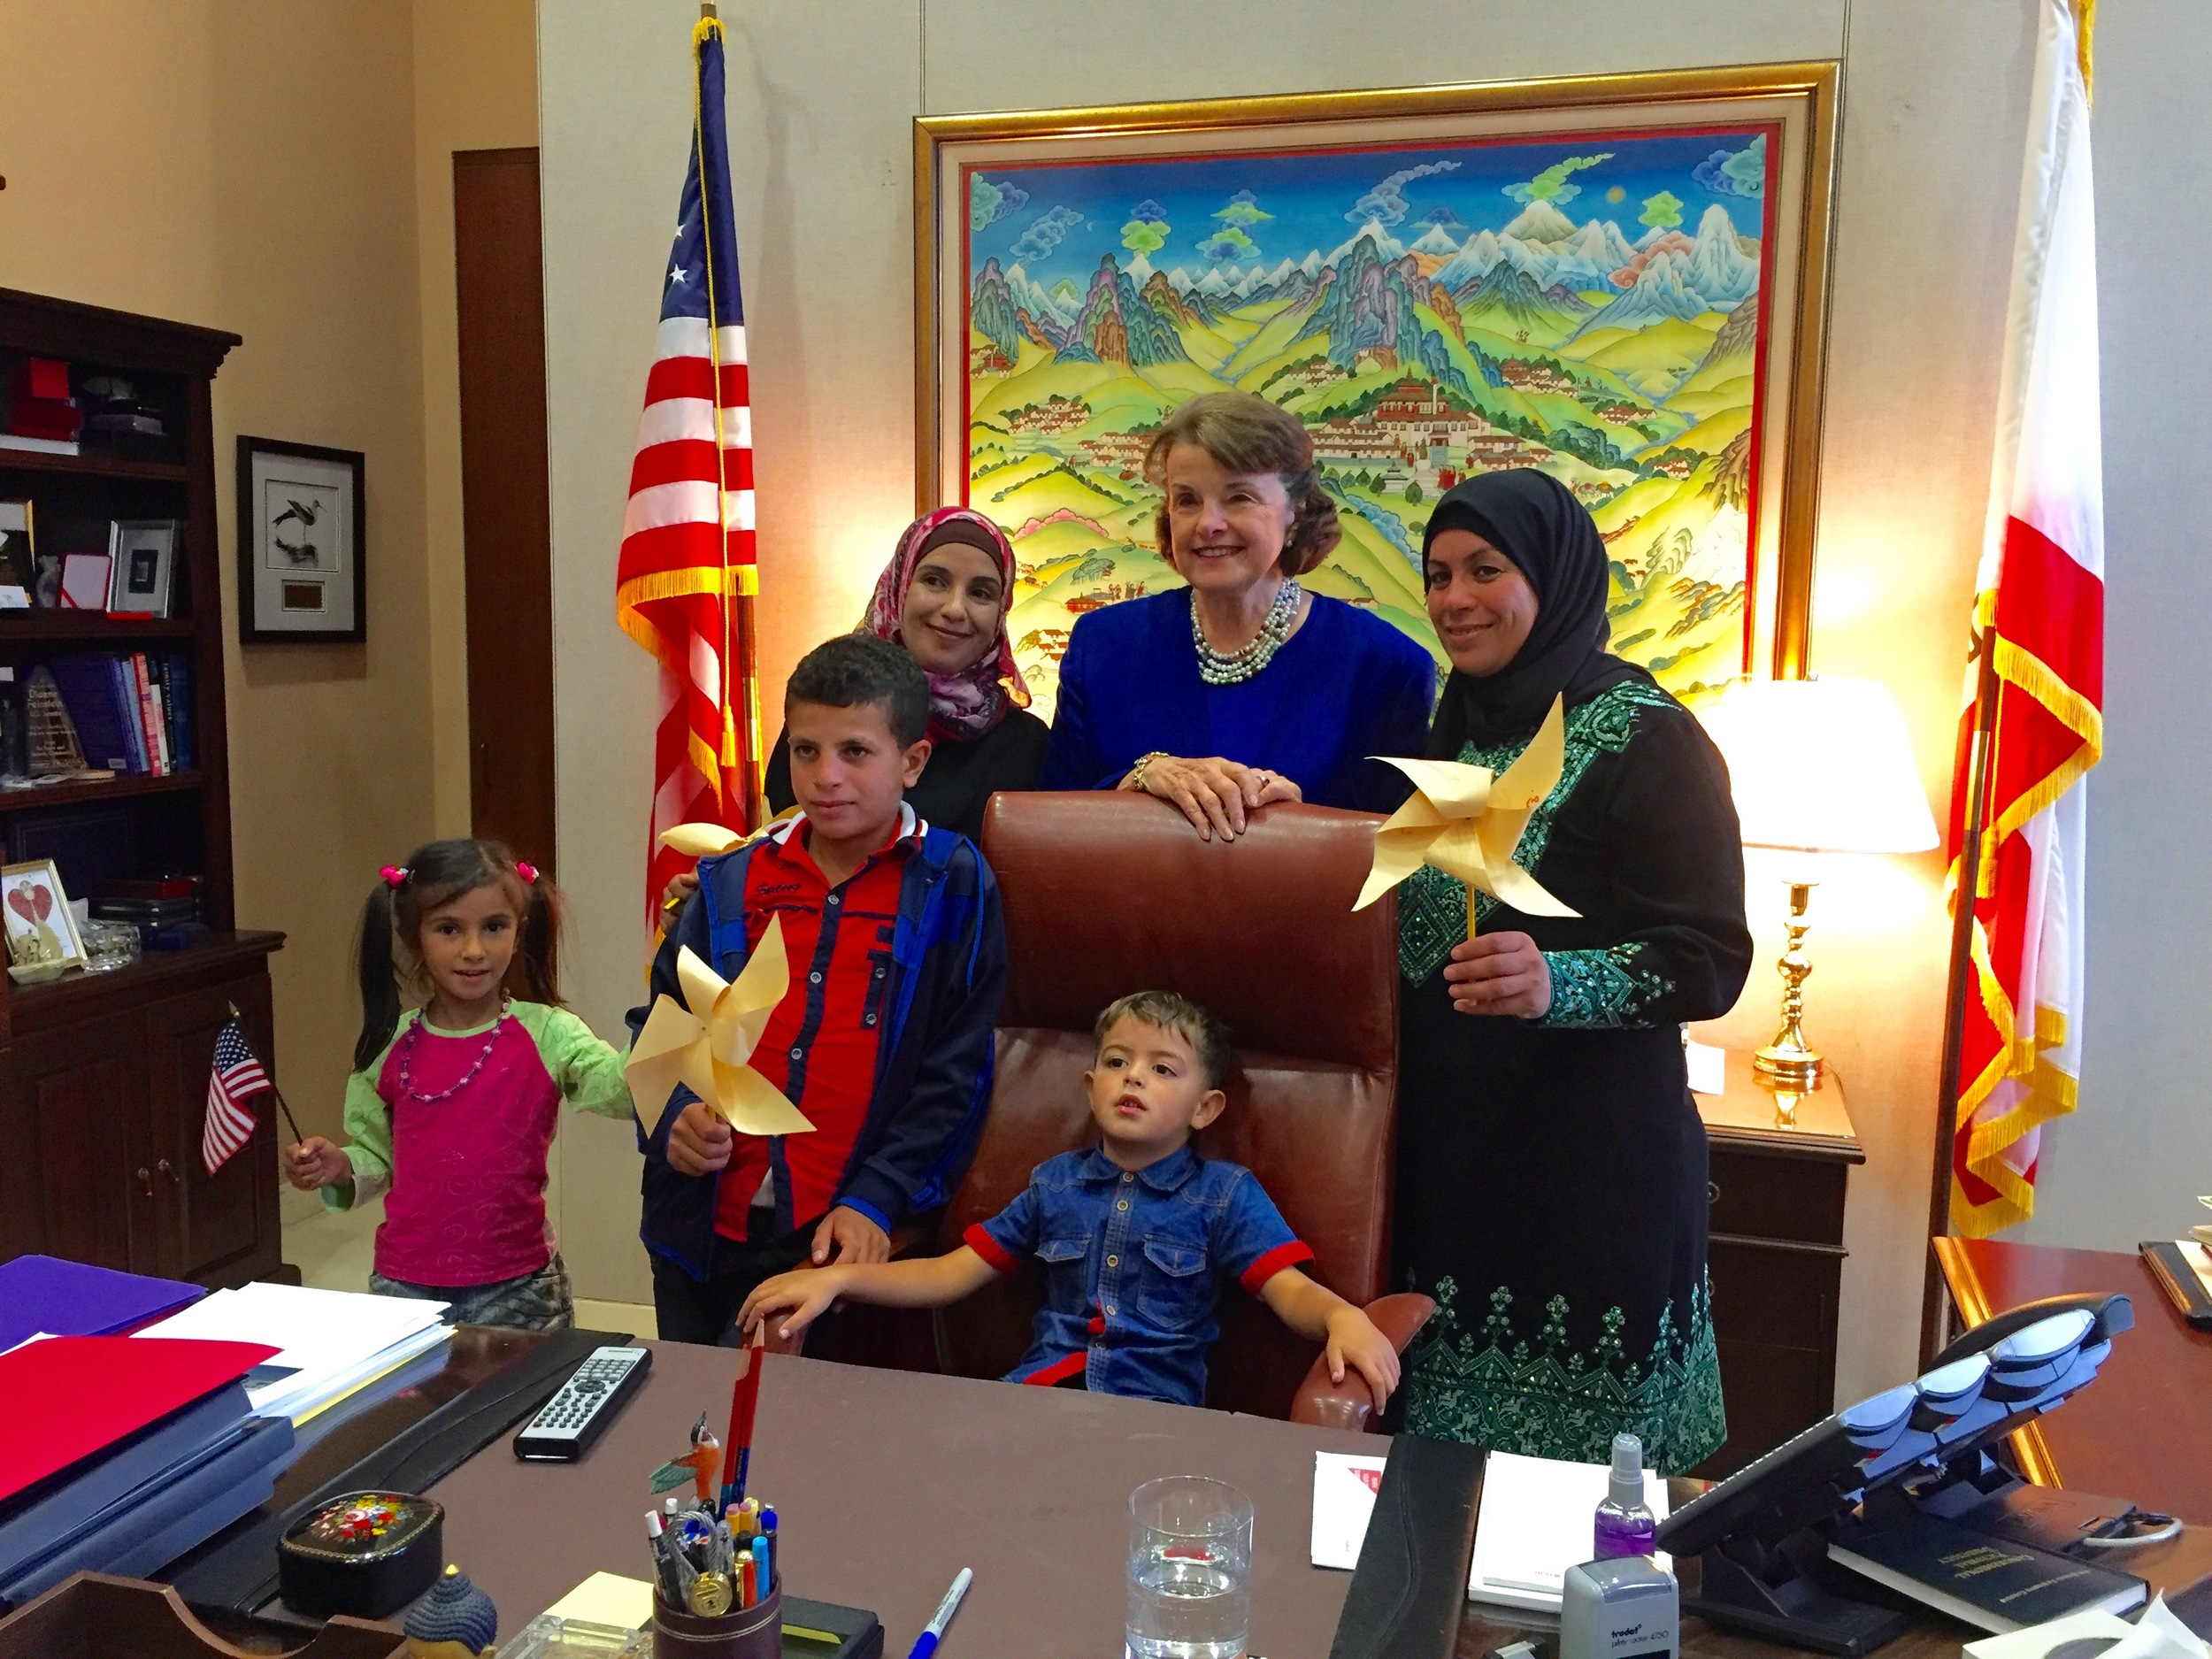 Senator Dianne Feinstein with families from Umm al-Kheir and Susiya in September 2015.